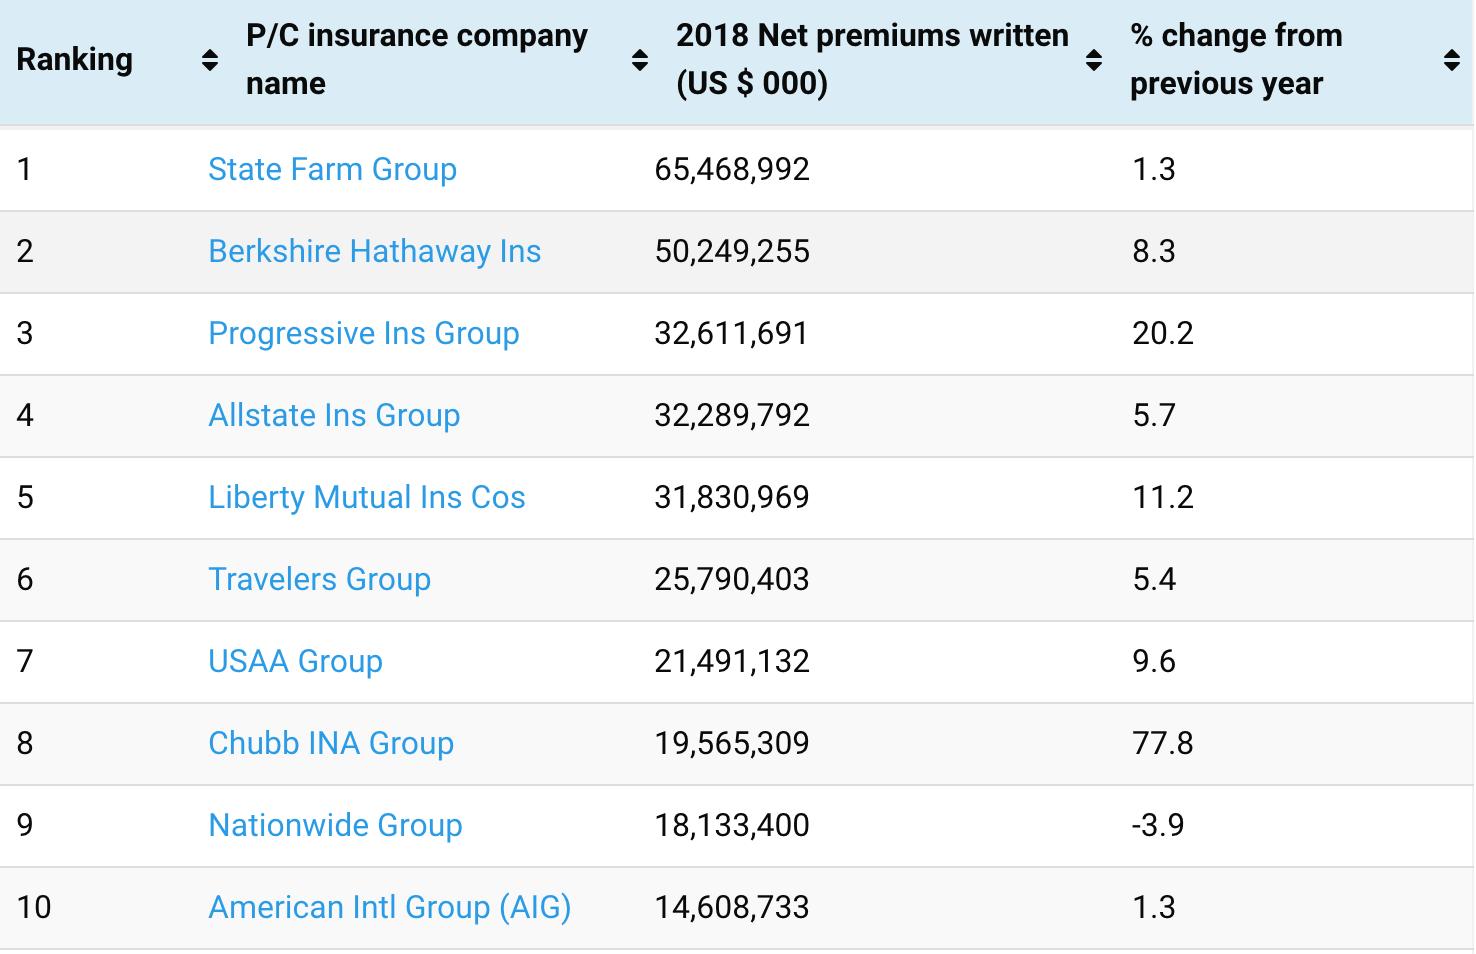 2018 top 10 US P&C insurers